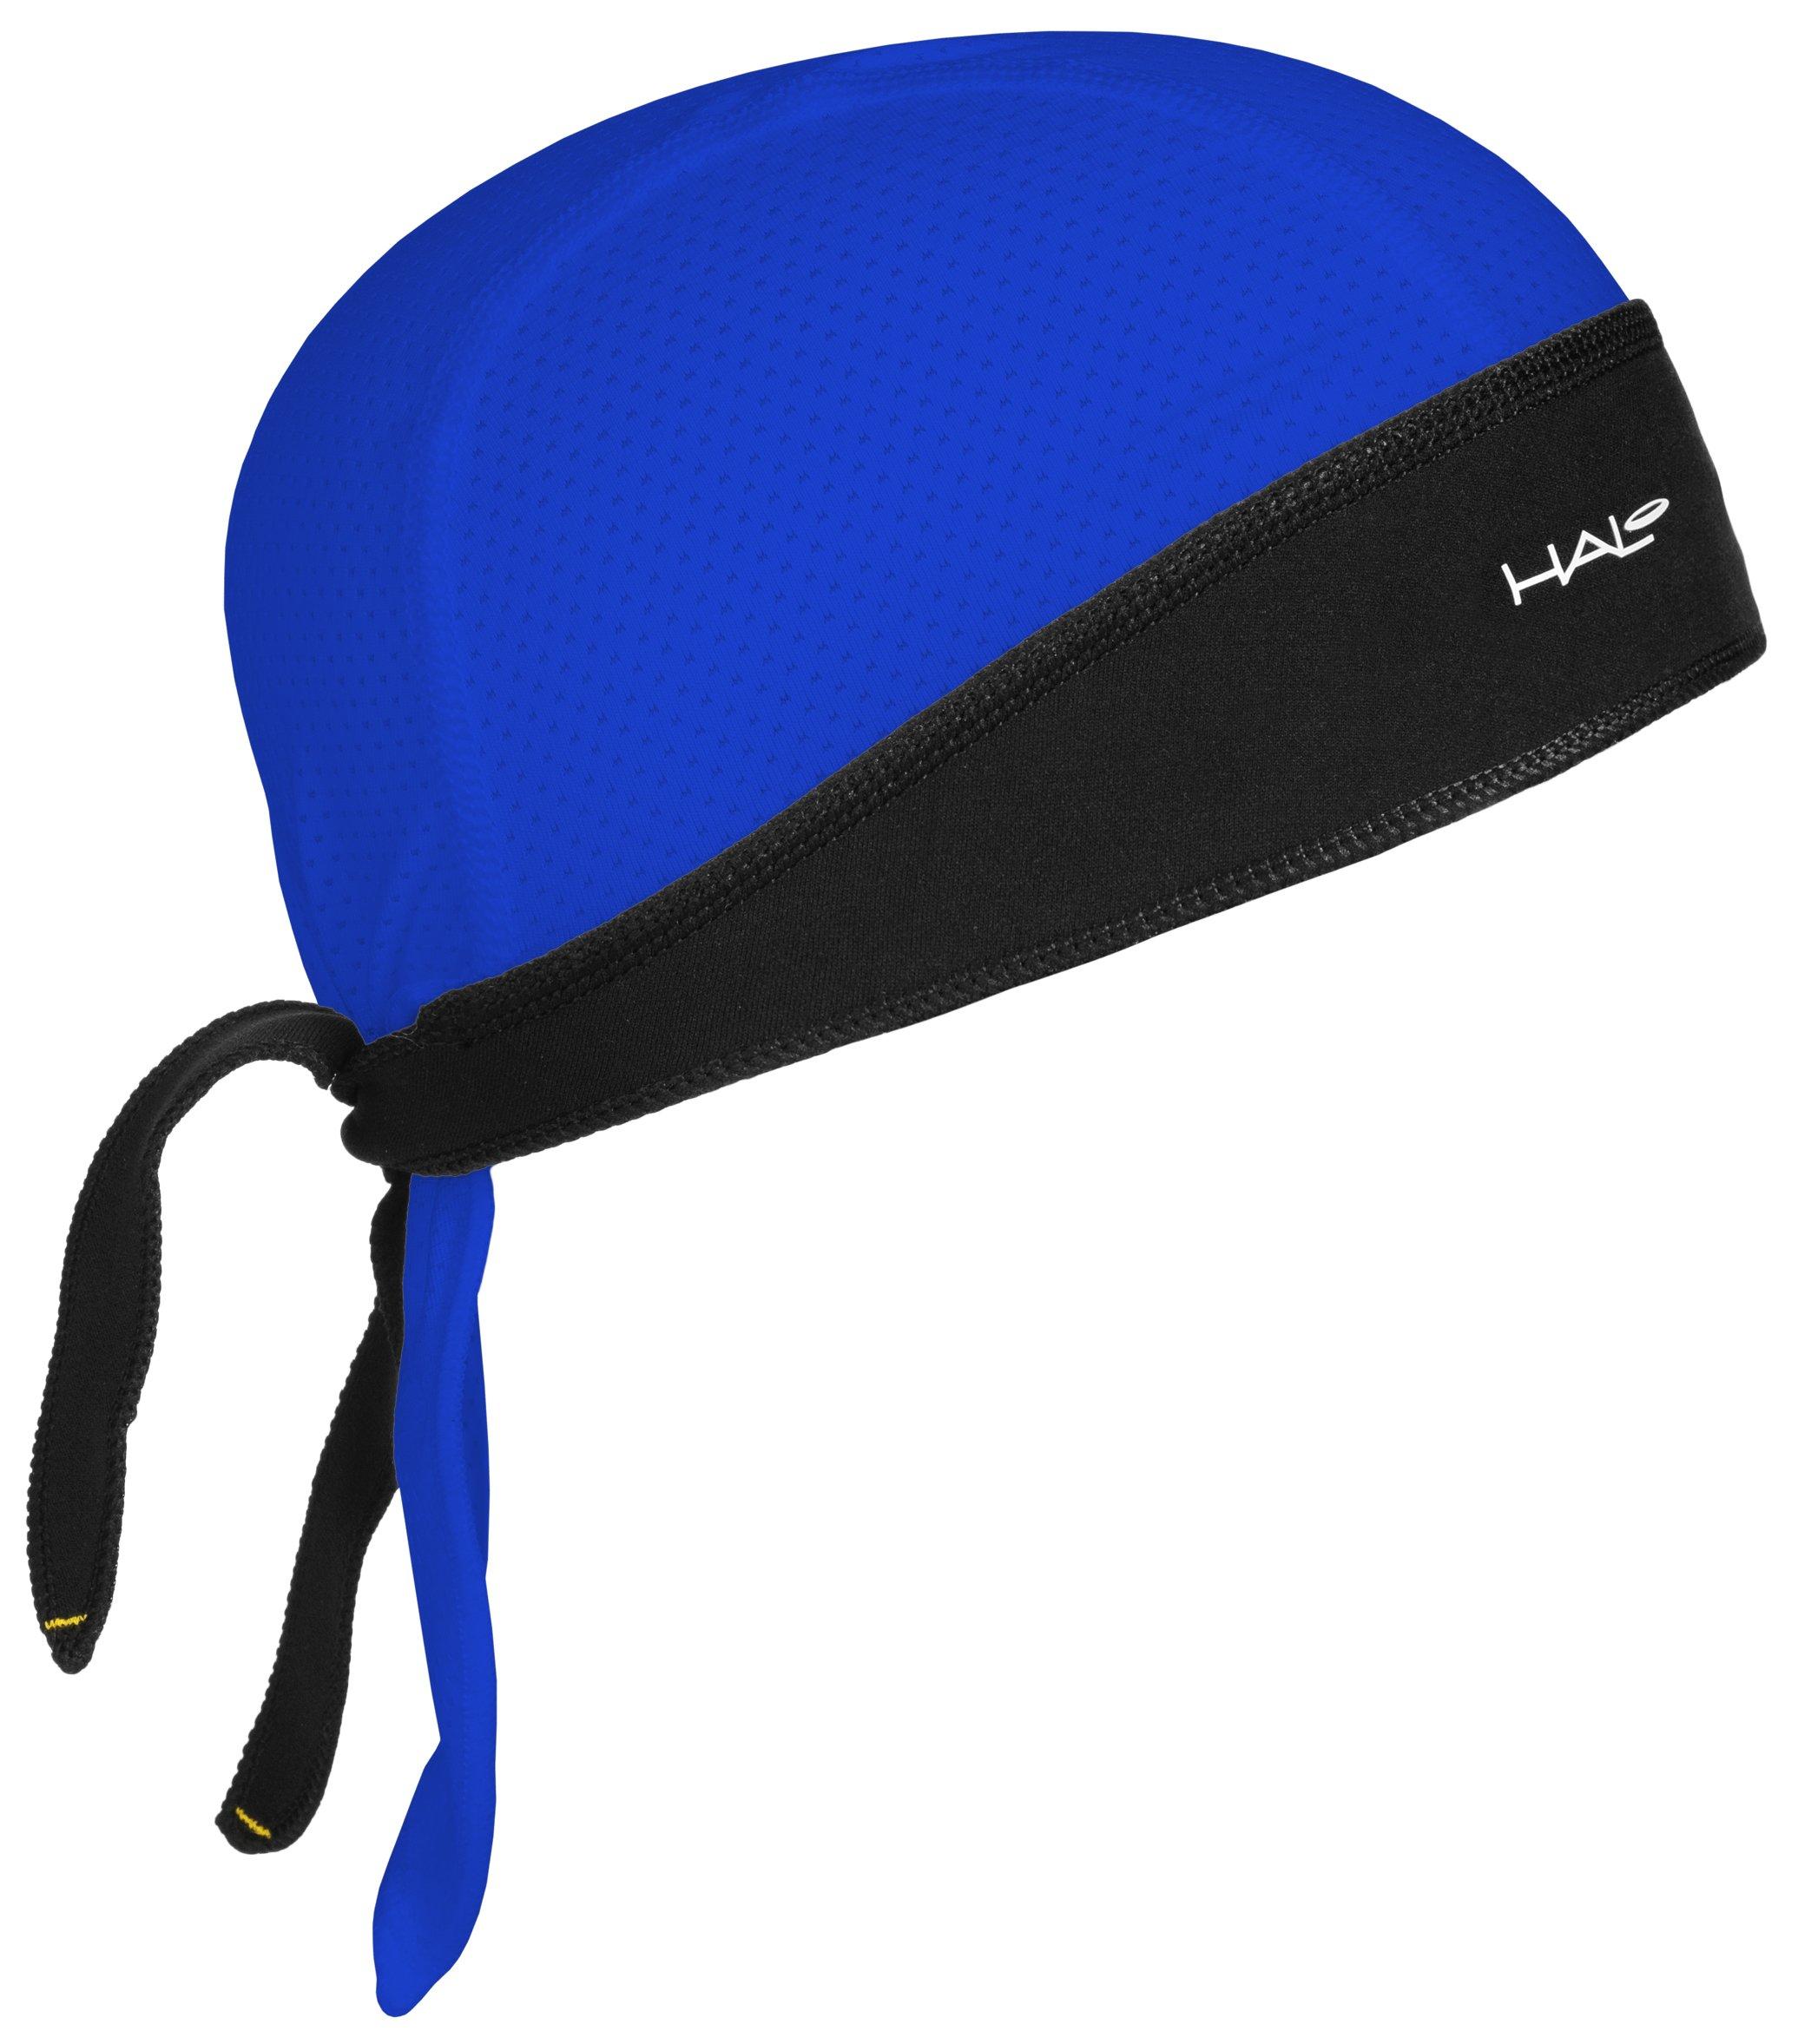 7ff8be1f9d3 Halo Headband Bandana - Protex - The Ultimate High Performance Bandana  product image